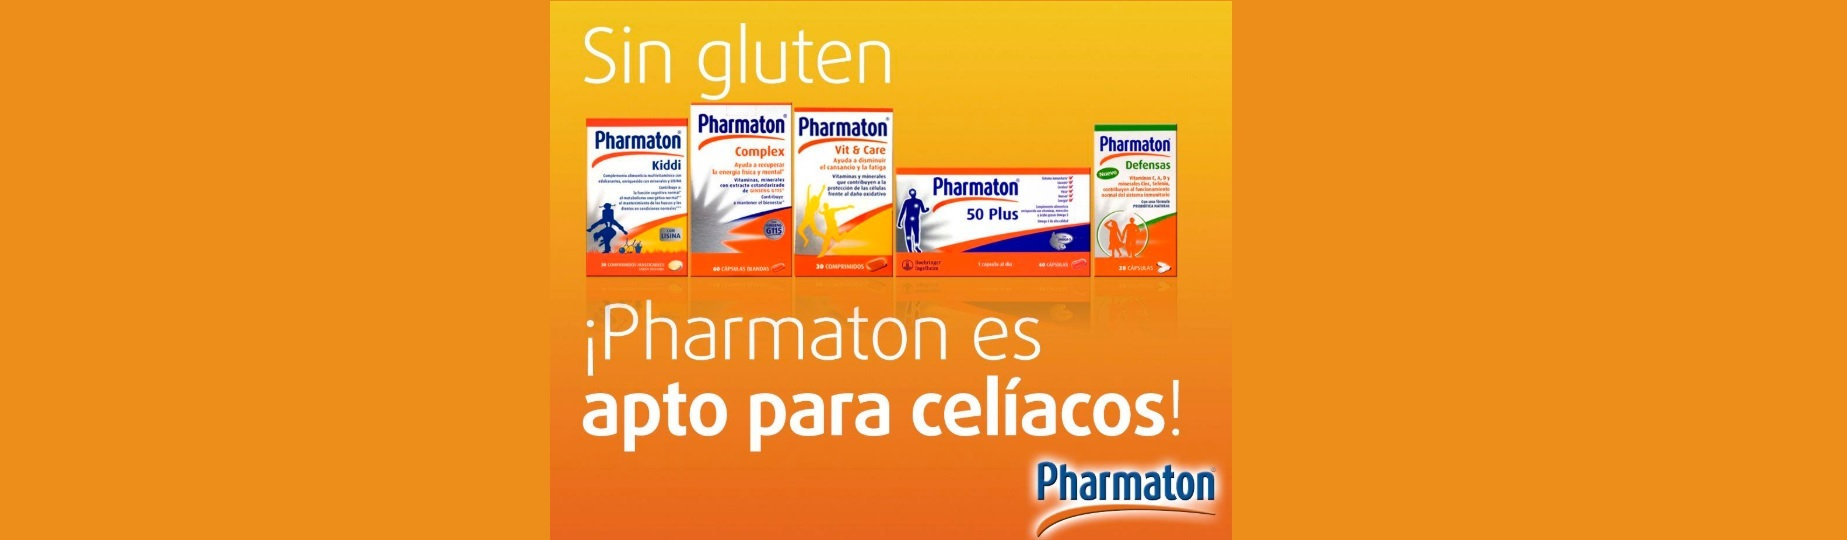 Pharmaton Productos en Farma2go